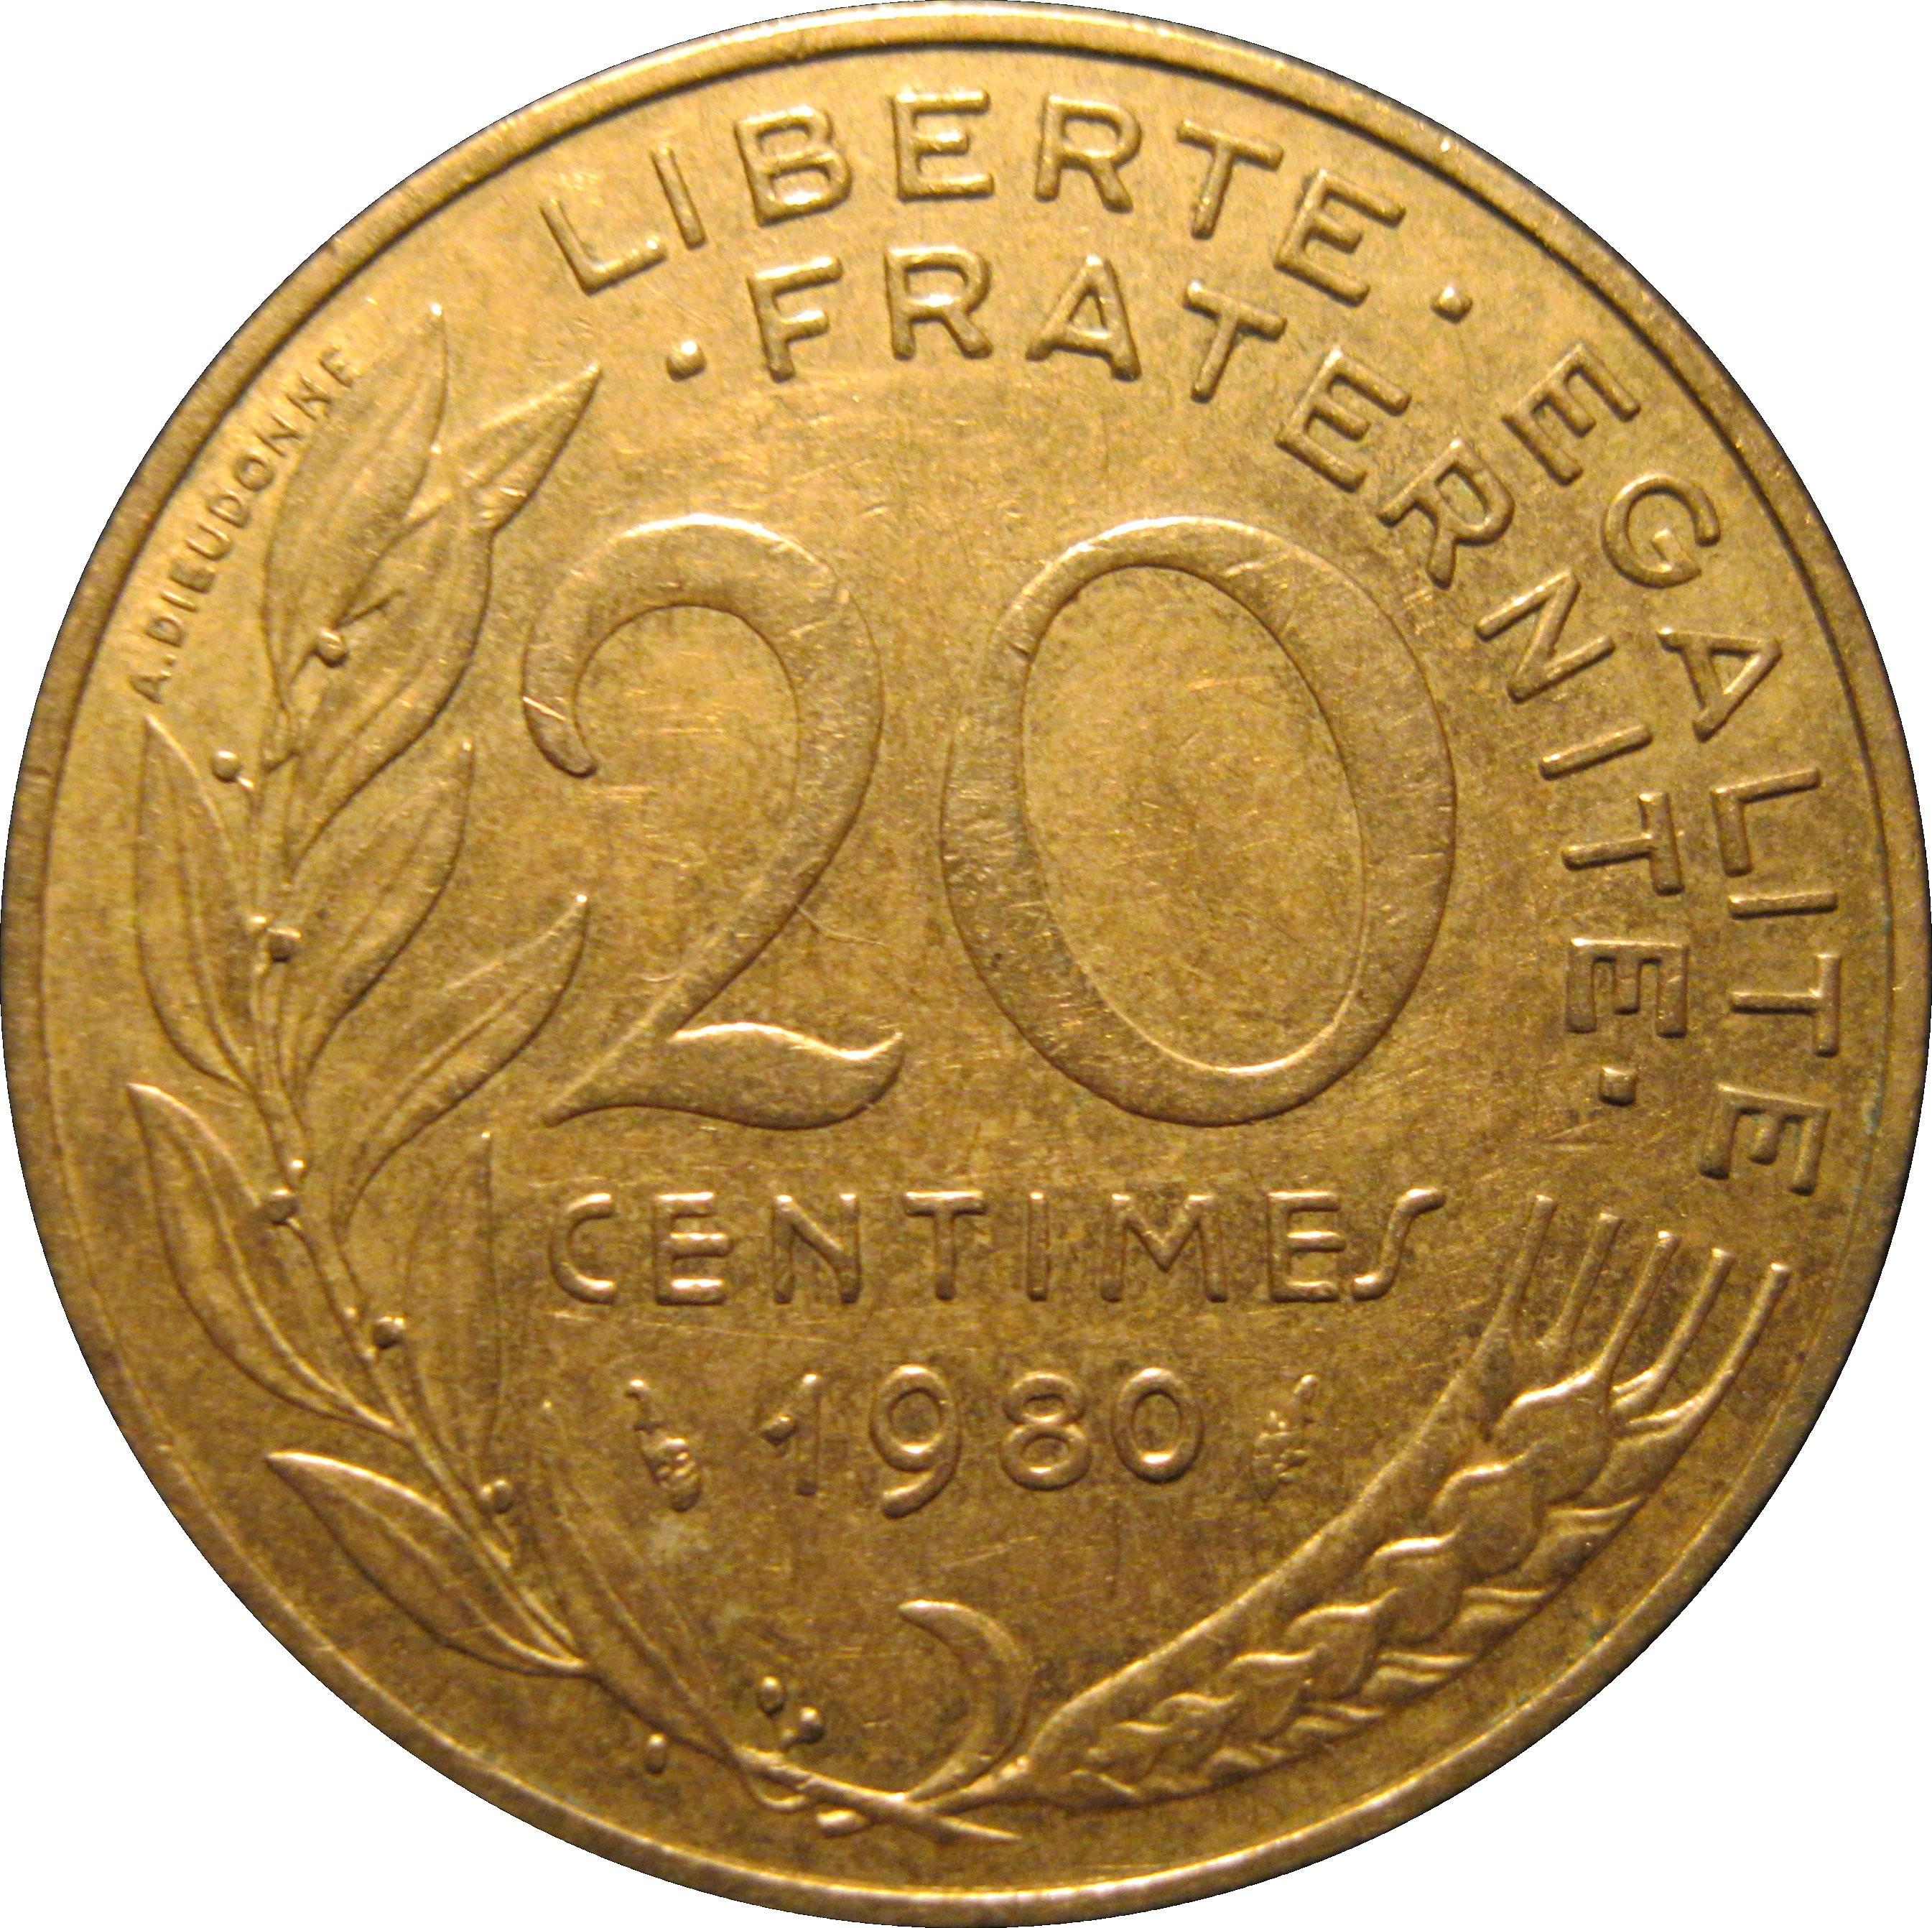 France 20 Centimes (1962-2001)